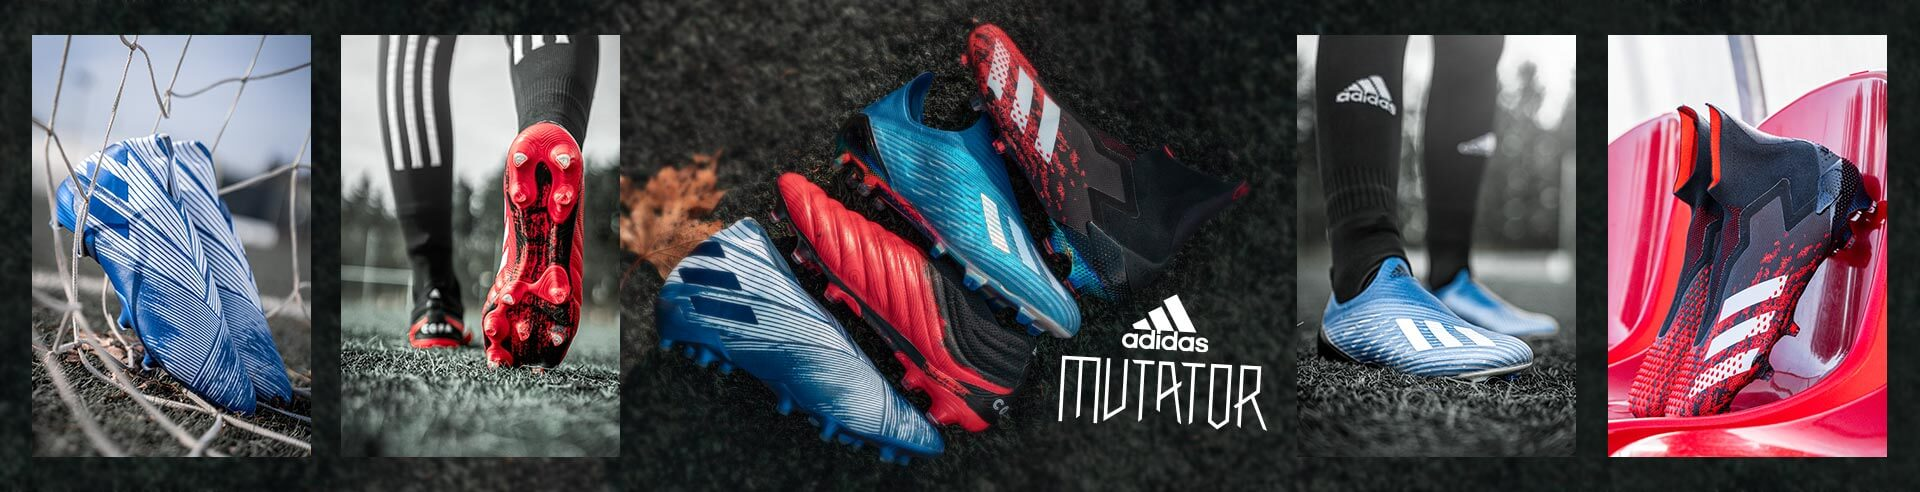 header_adidas